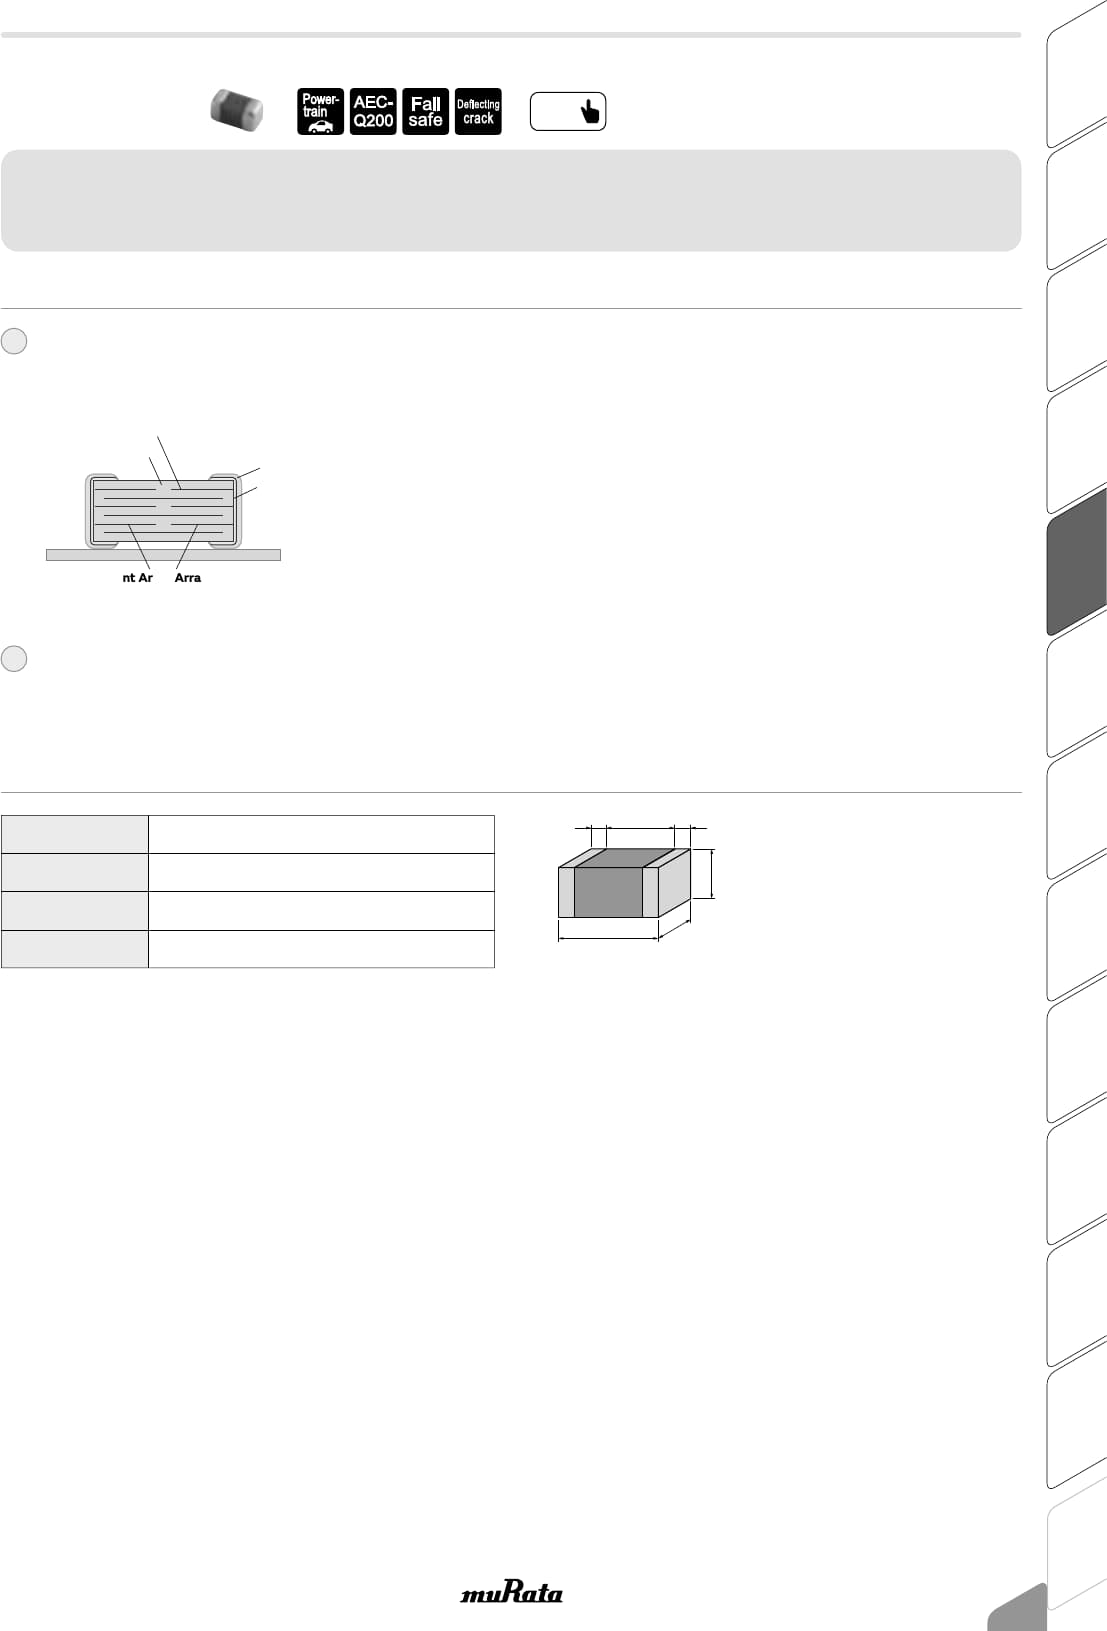 hight resolution of grt seriesgcm seriesgc3 seriesgcd seriesgce seriesgcg series gcj serieskcm serieskc3 serieskca series nmf series